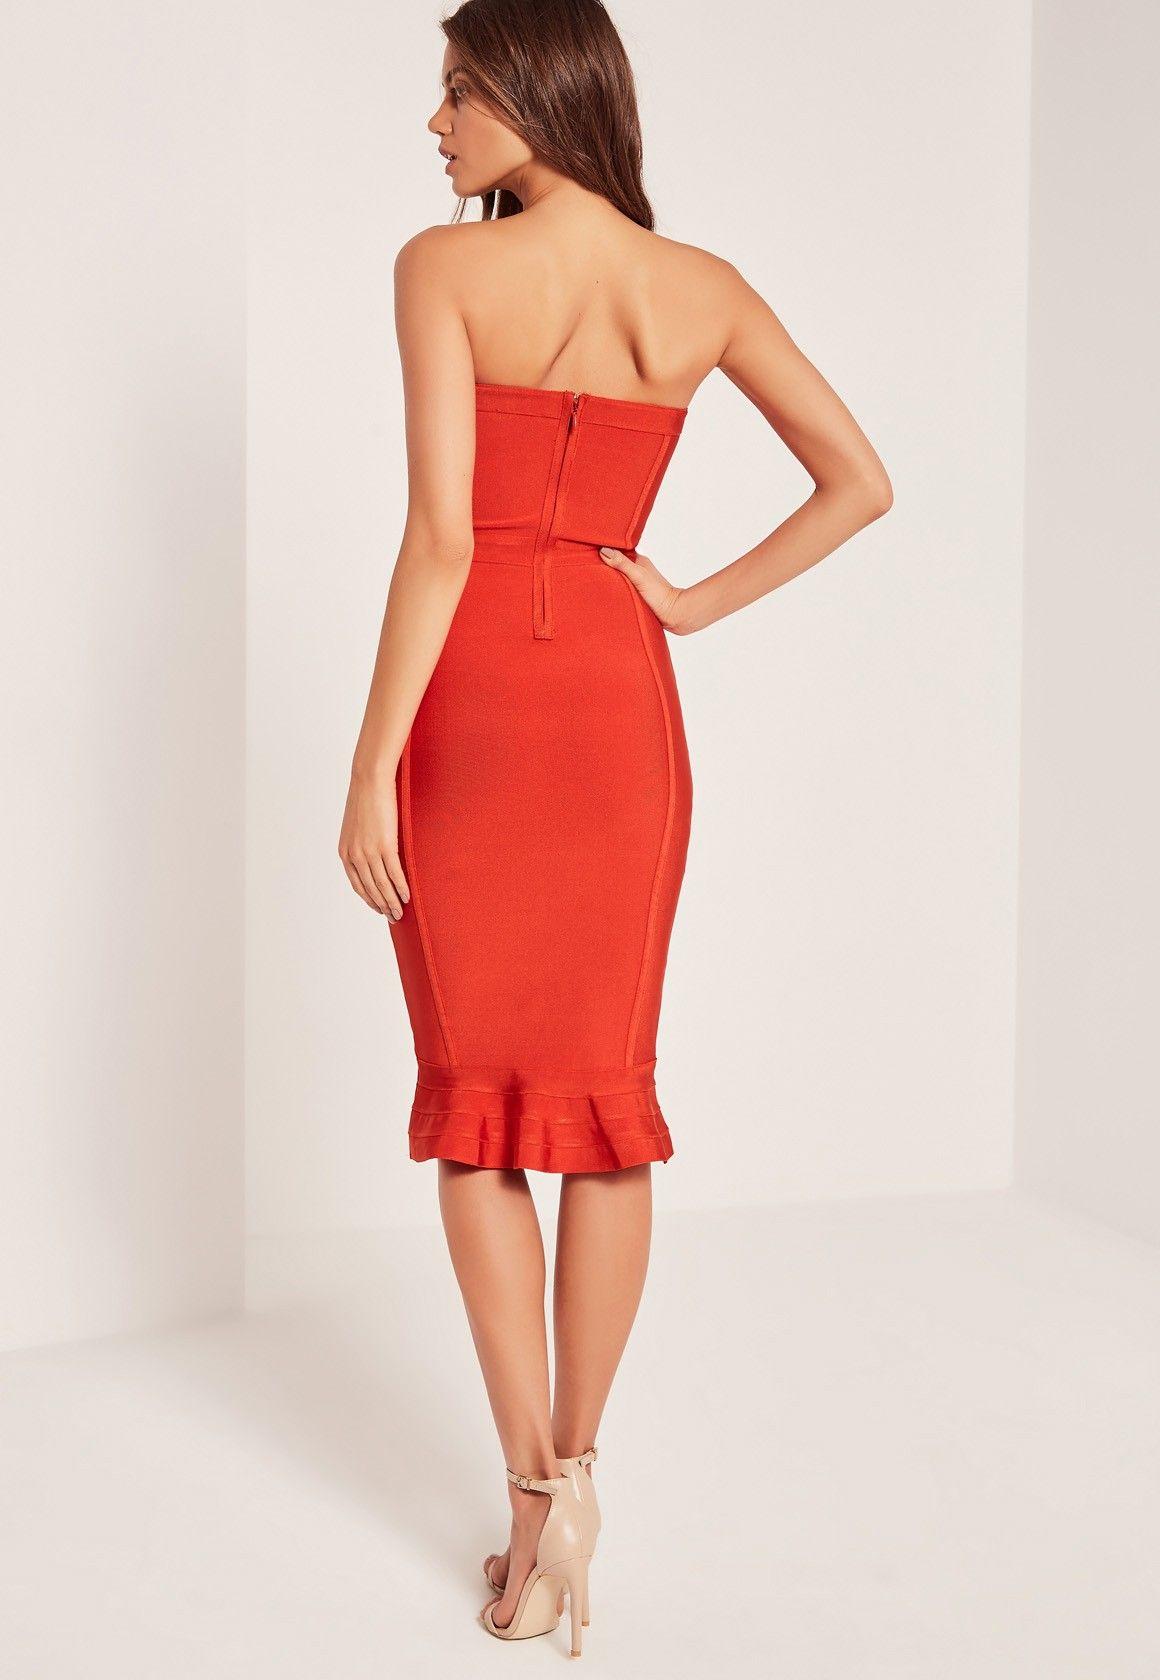 99c9f5e1153 Missguided - Premium Bandage Bandeau Frill Hem Midi Dress Red